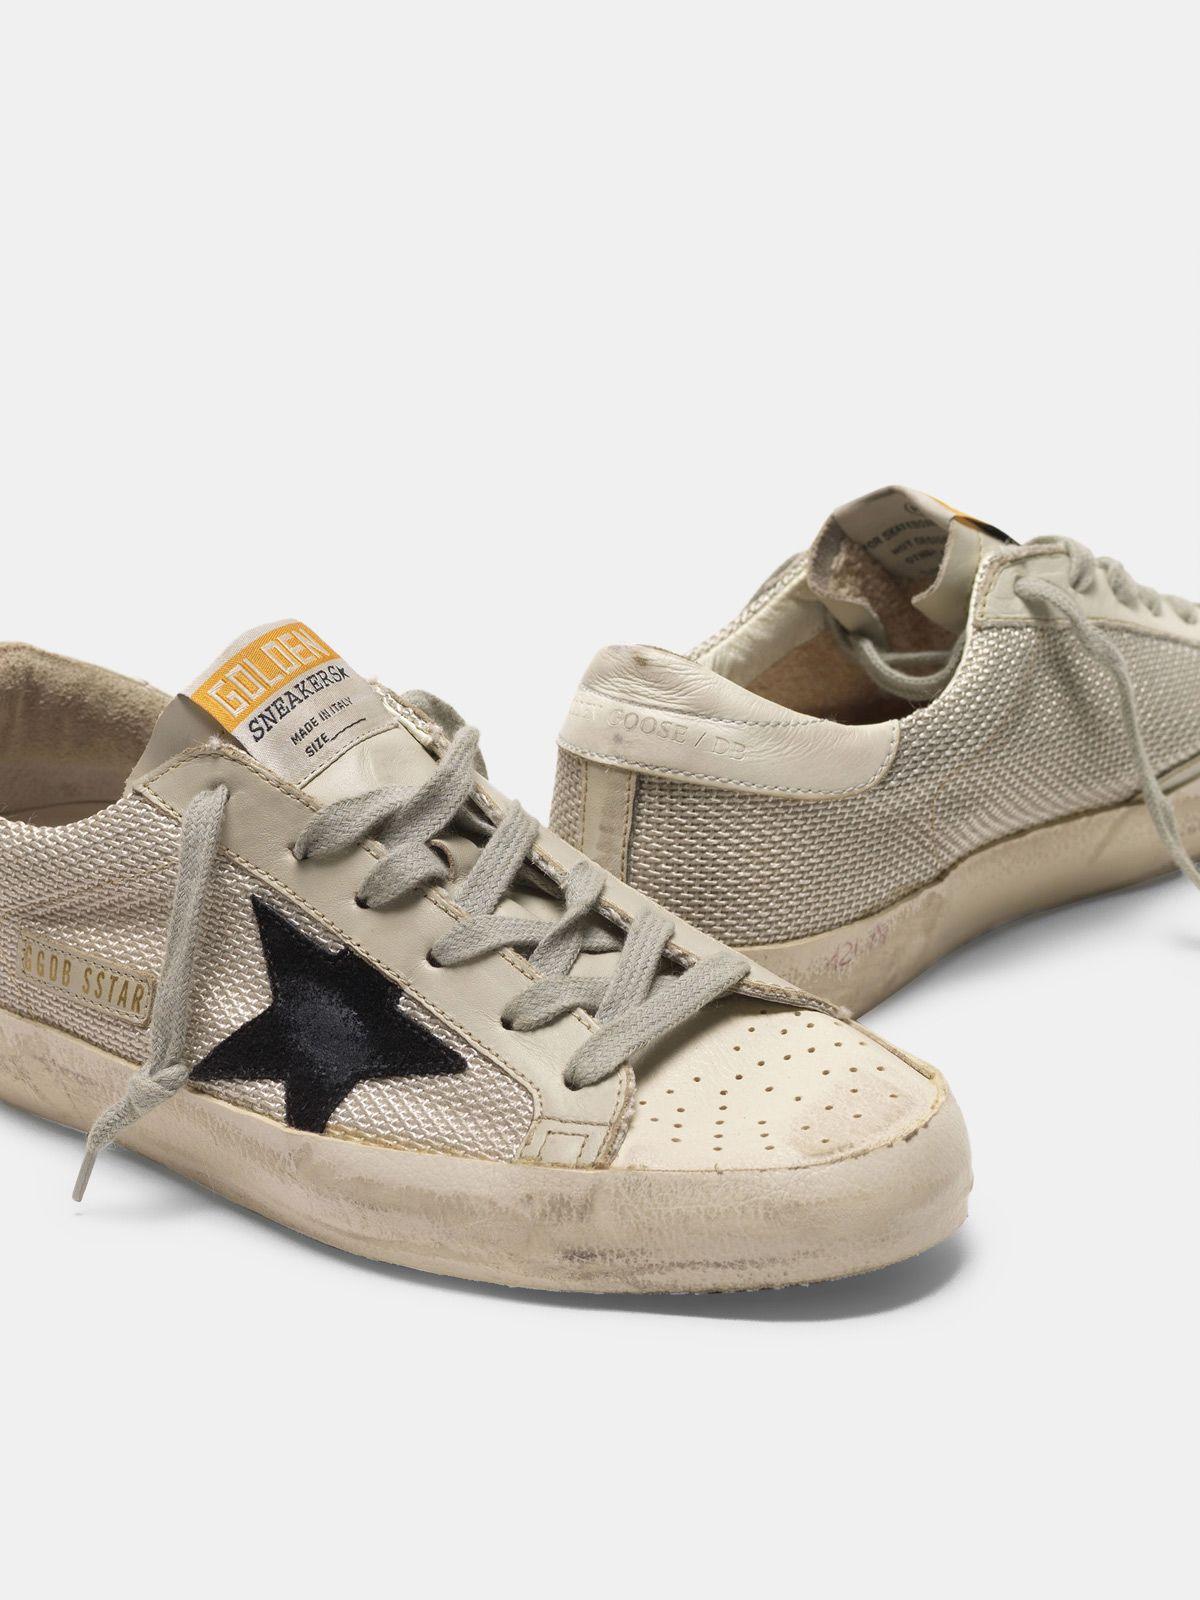 Golden Goose - Sneakers Super-Star in pelle con inserto in mesh in